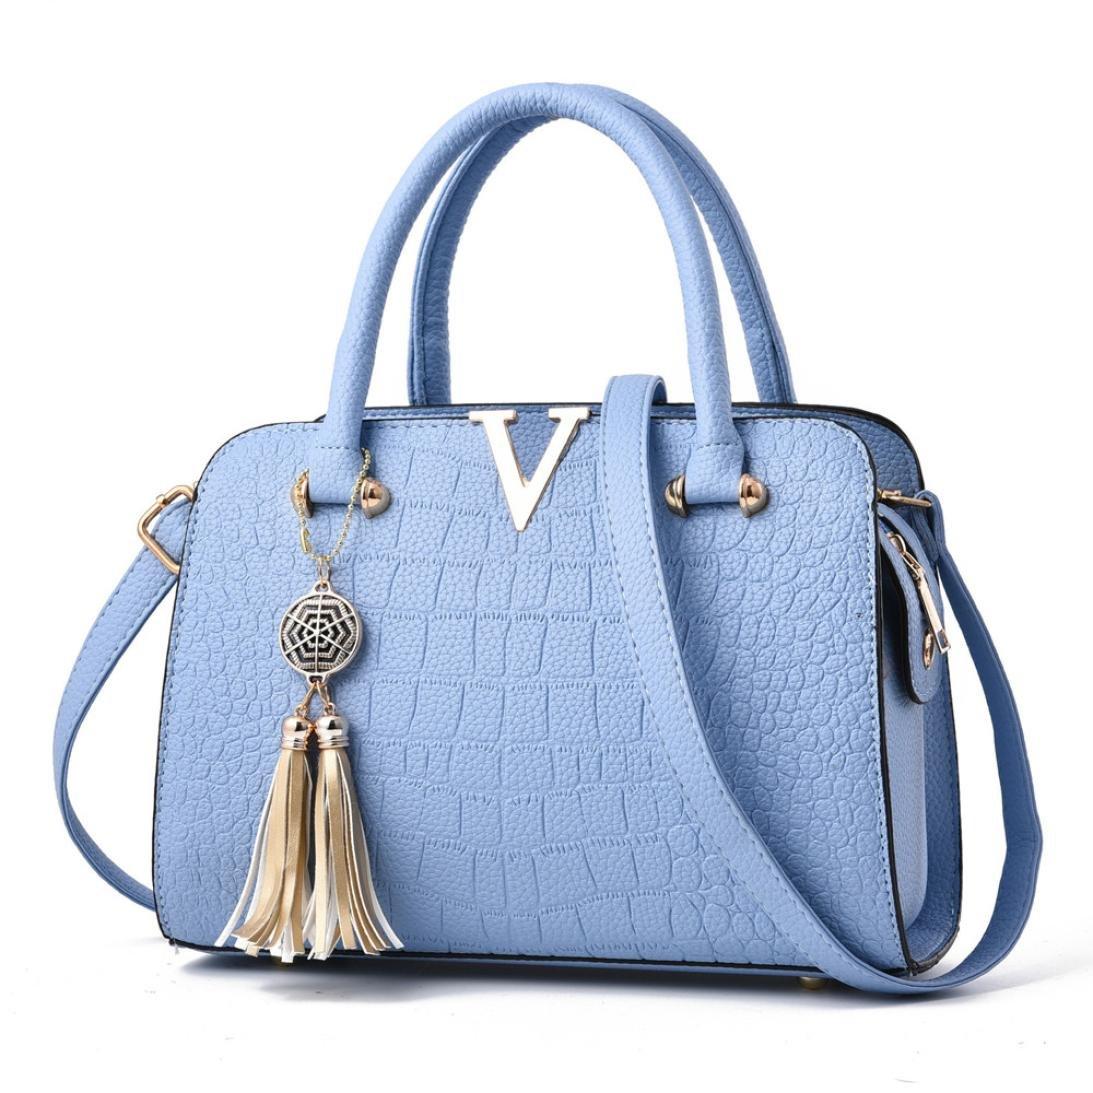 688f6f92444 Neartime Women Handbag, 2018 Woman s Tassel Crossbody Bags Leather Satchels Alligator  Pattern Zipper Shoulder Bag (❤️28cm(L)×13cm(W)×20cm(H), Light blue)